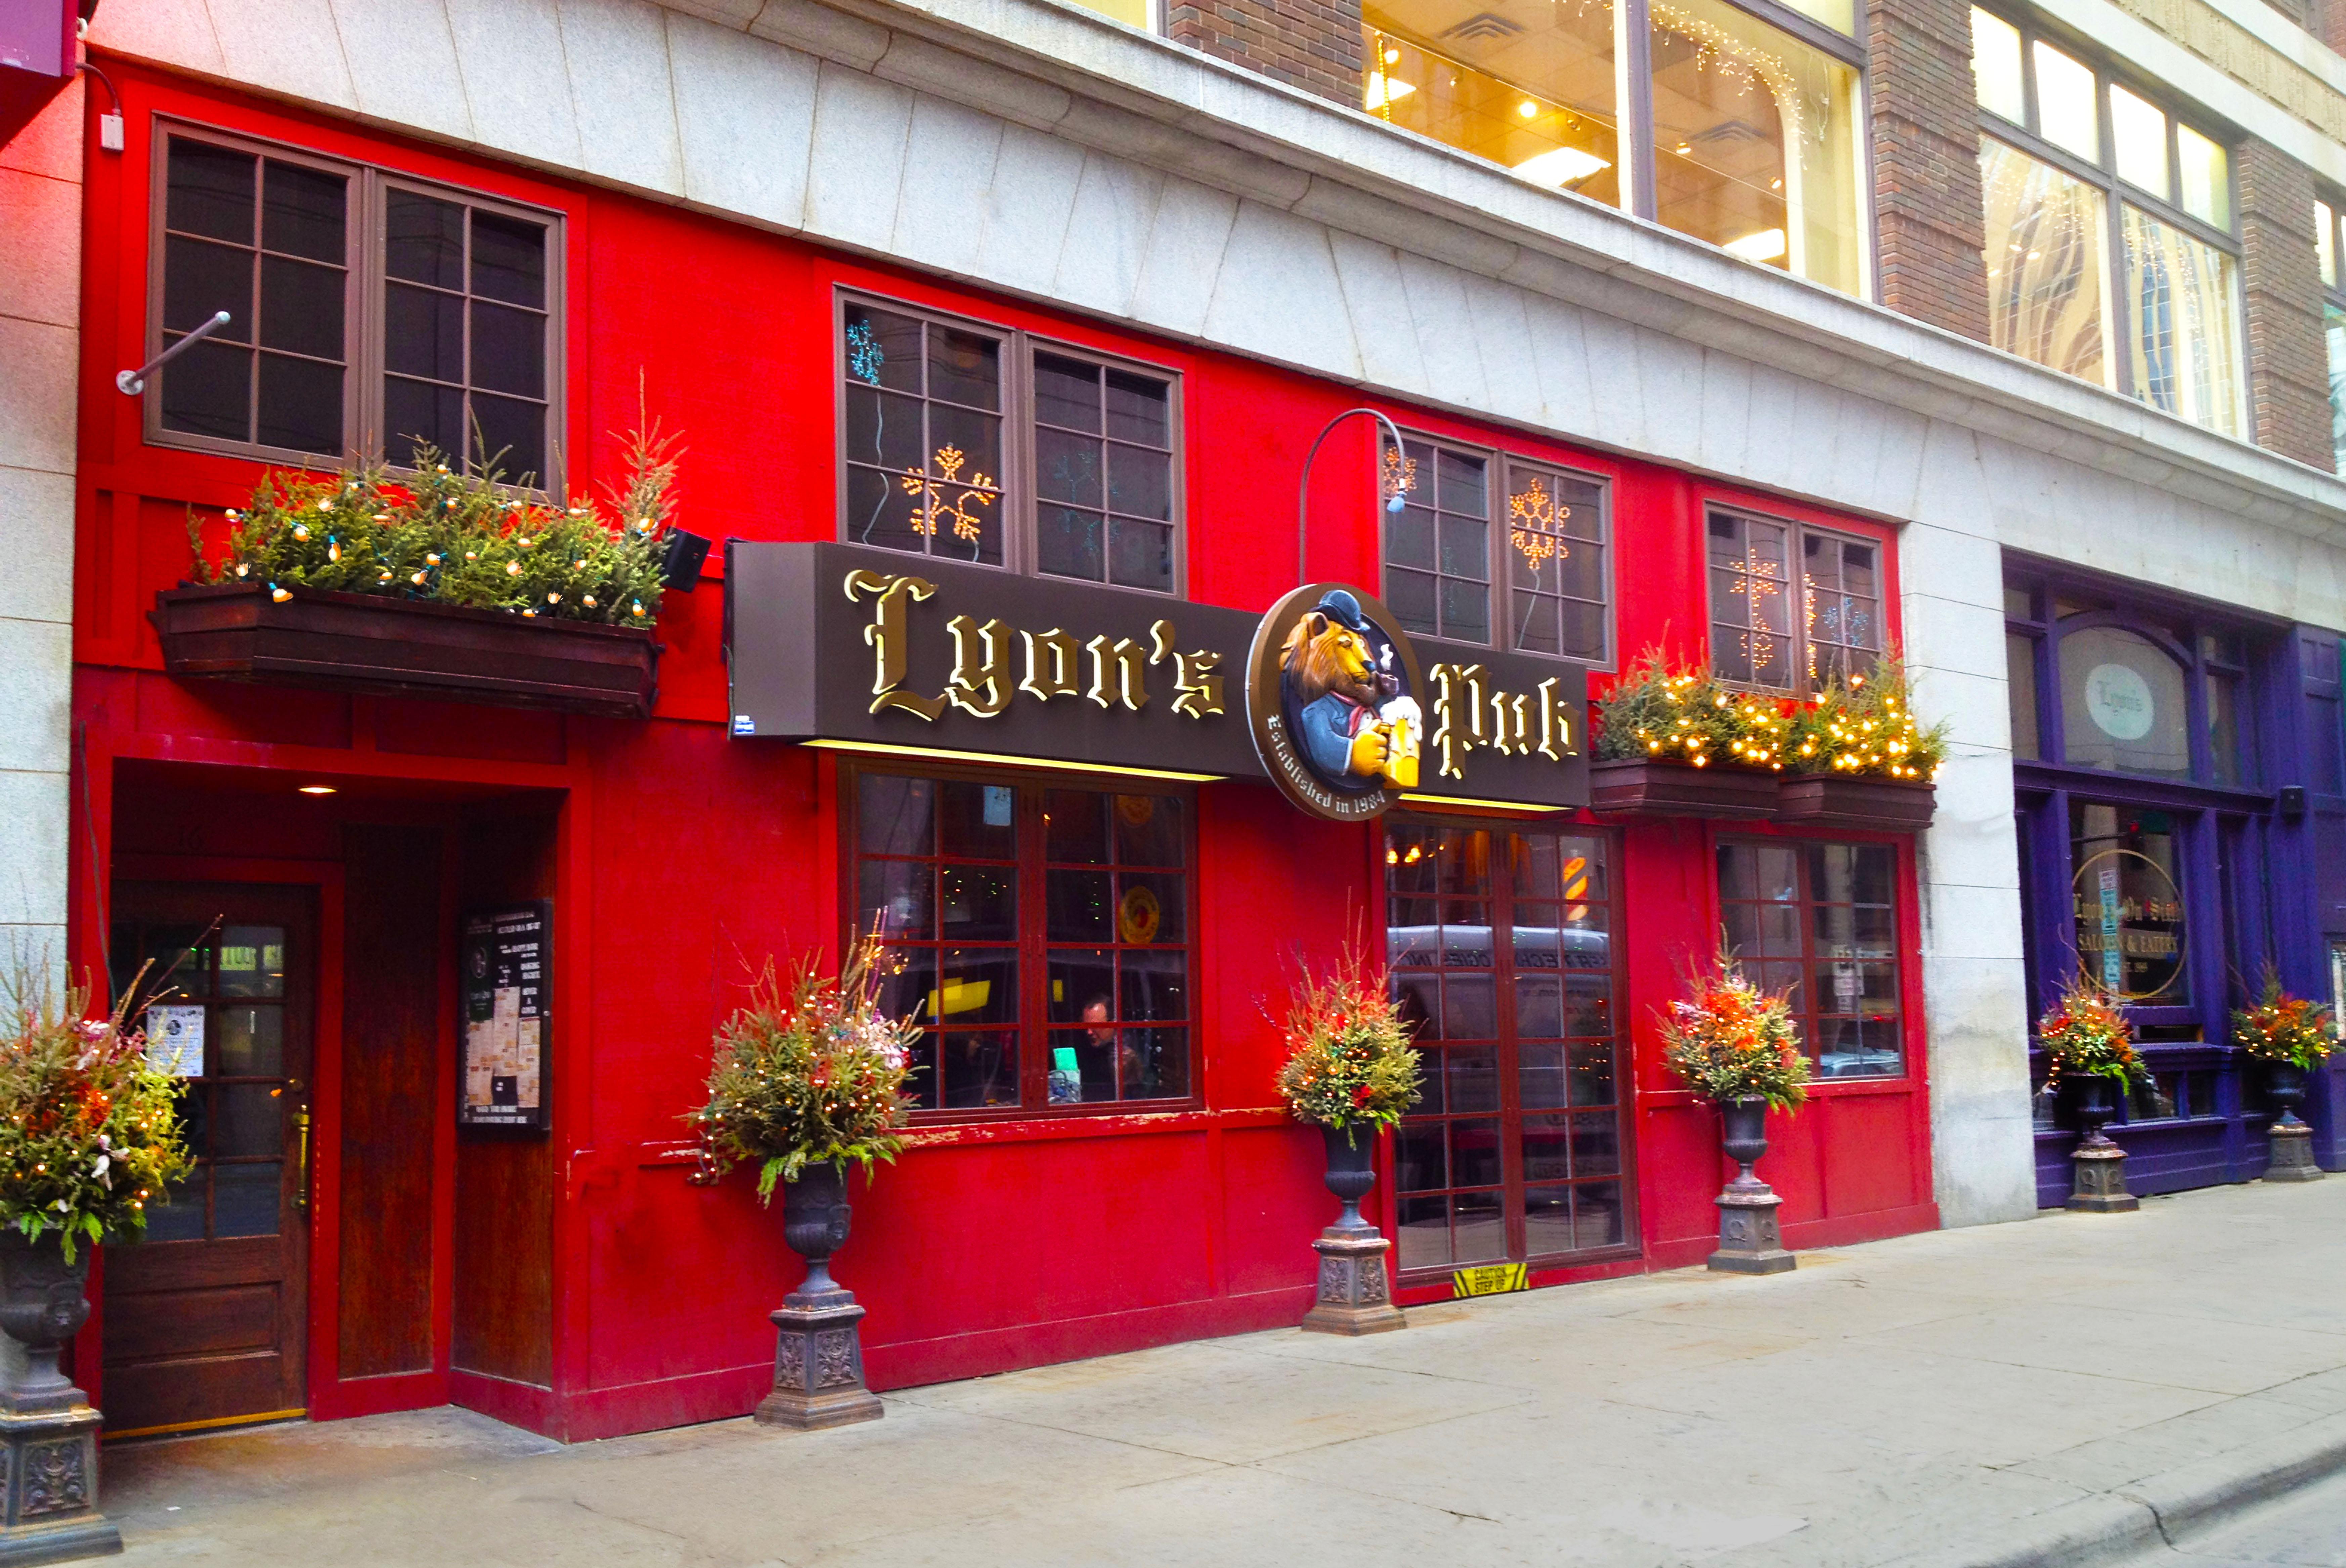 Lyon's Pub Minneapolis